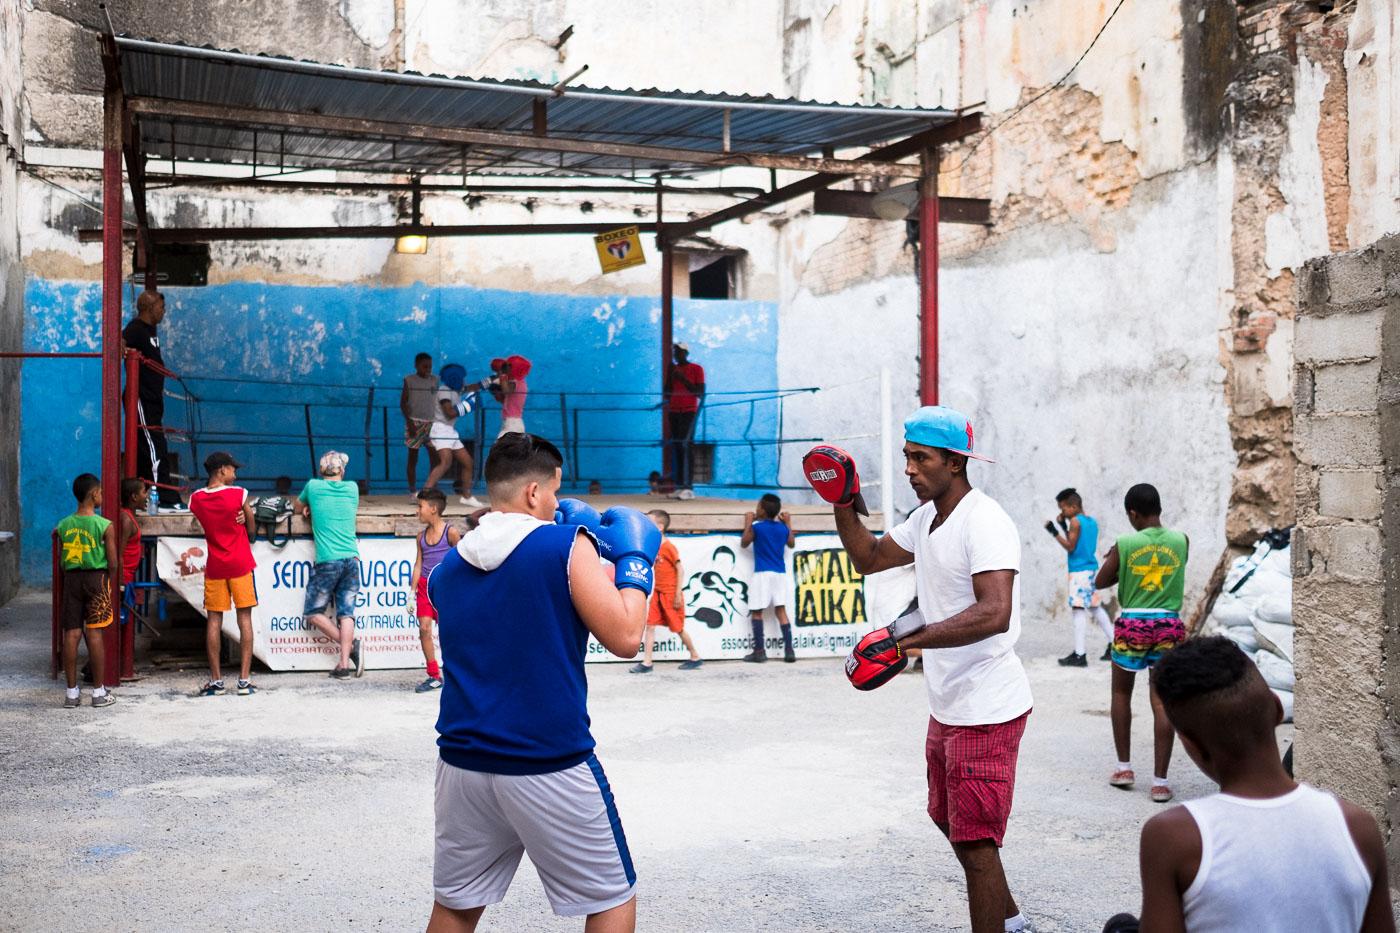 Gimnasio de Boxeo #6